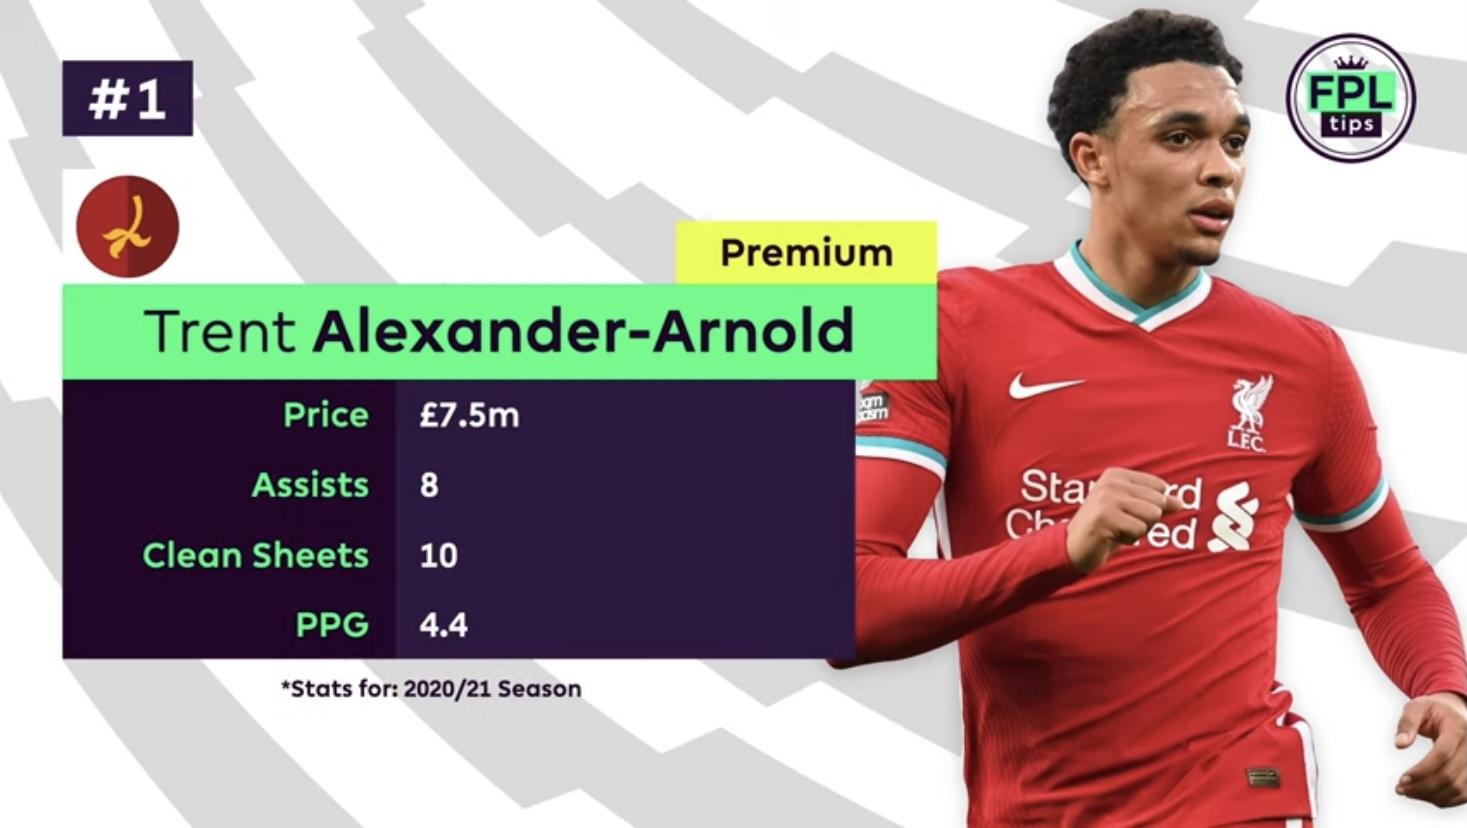 Top 5 FPL Defenders for 2021/21 Fantasy Premier League season - Trent Alexander-arnold